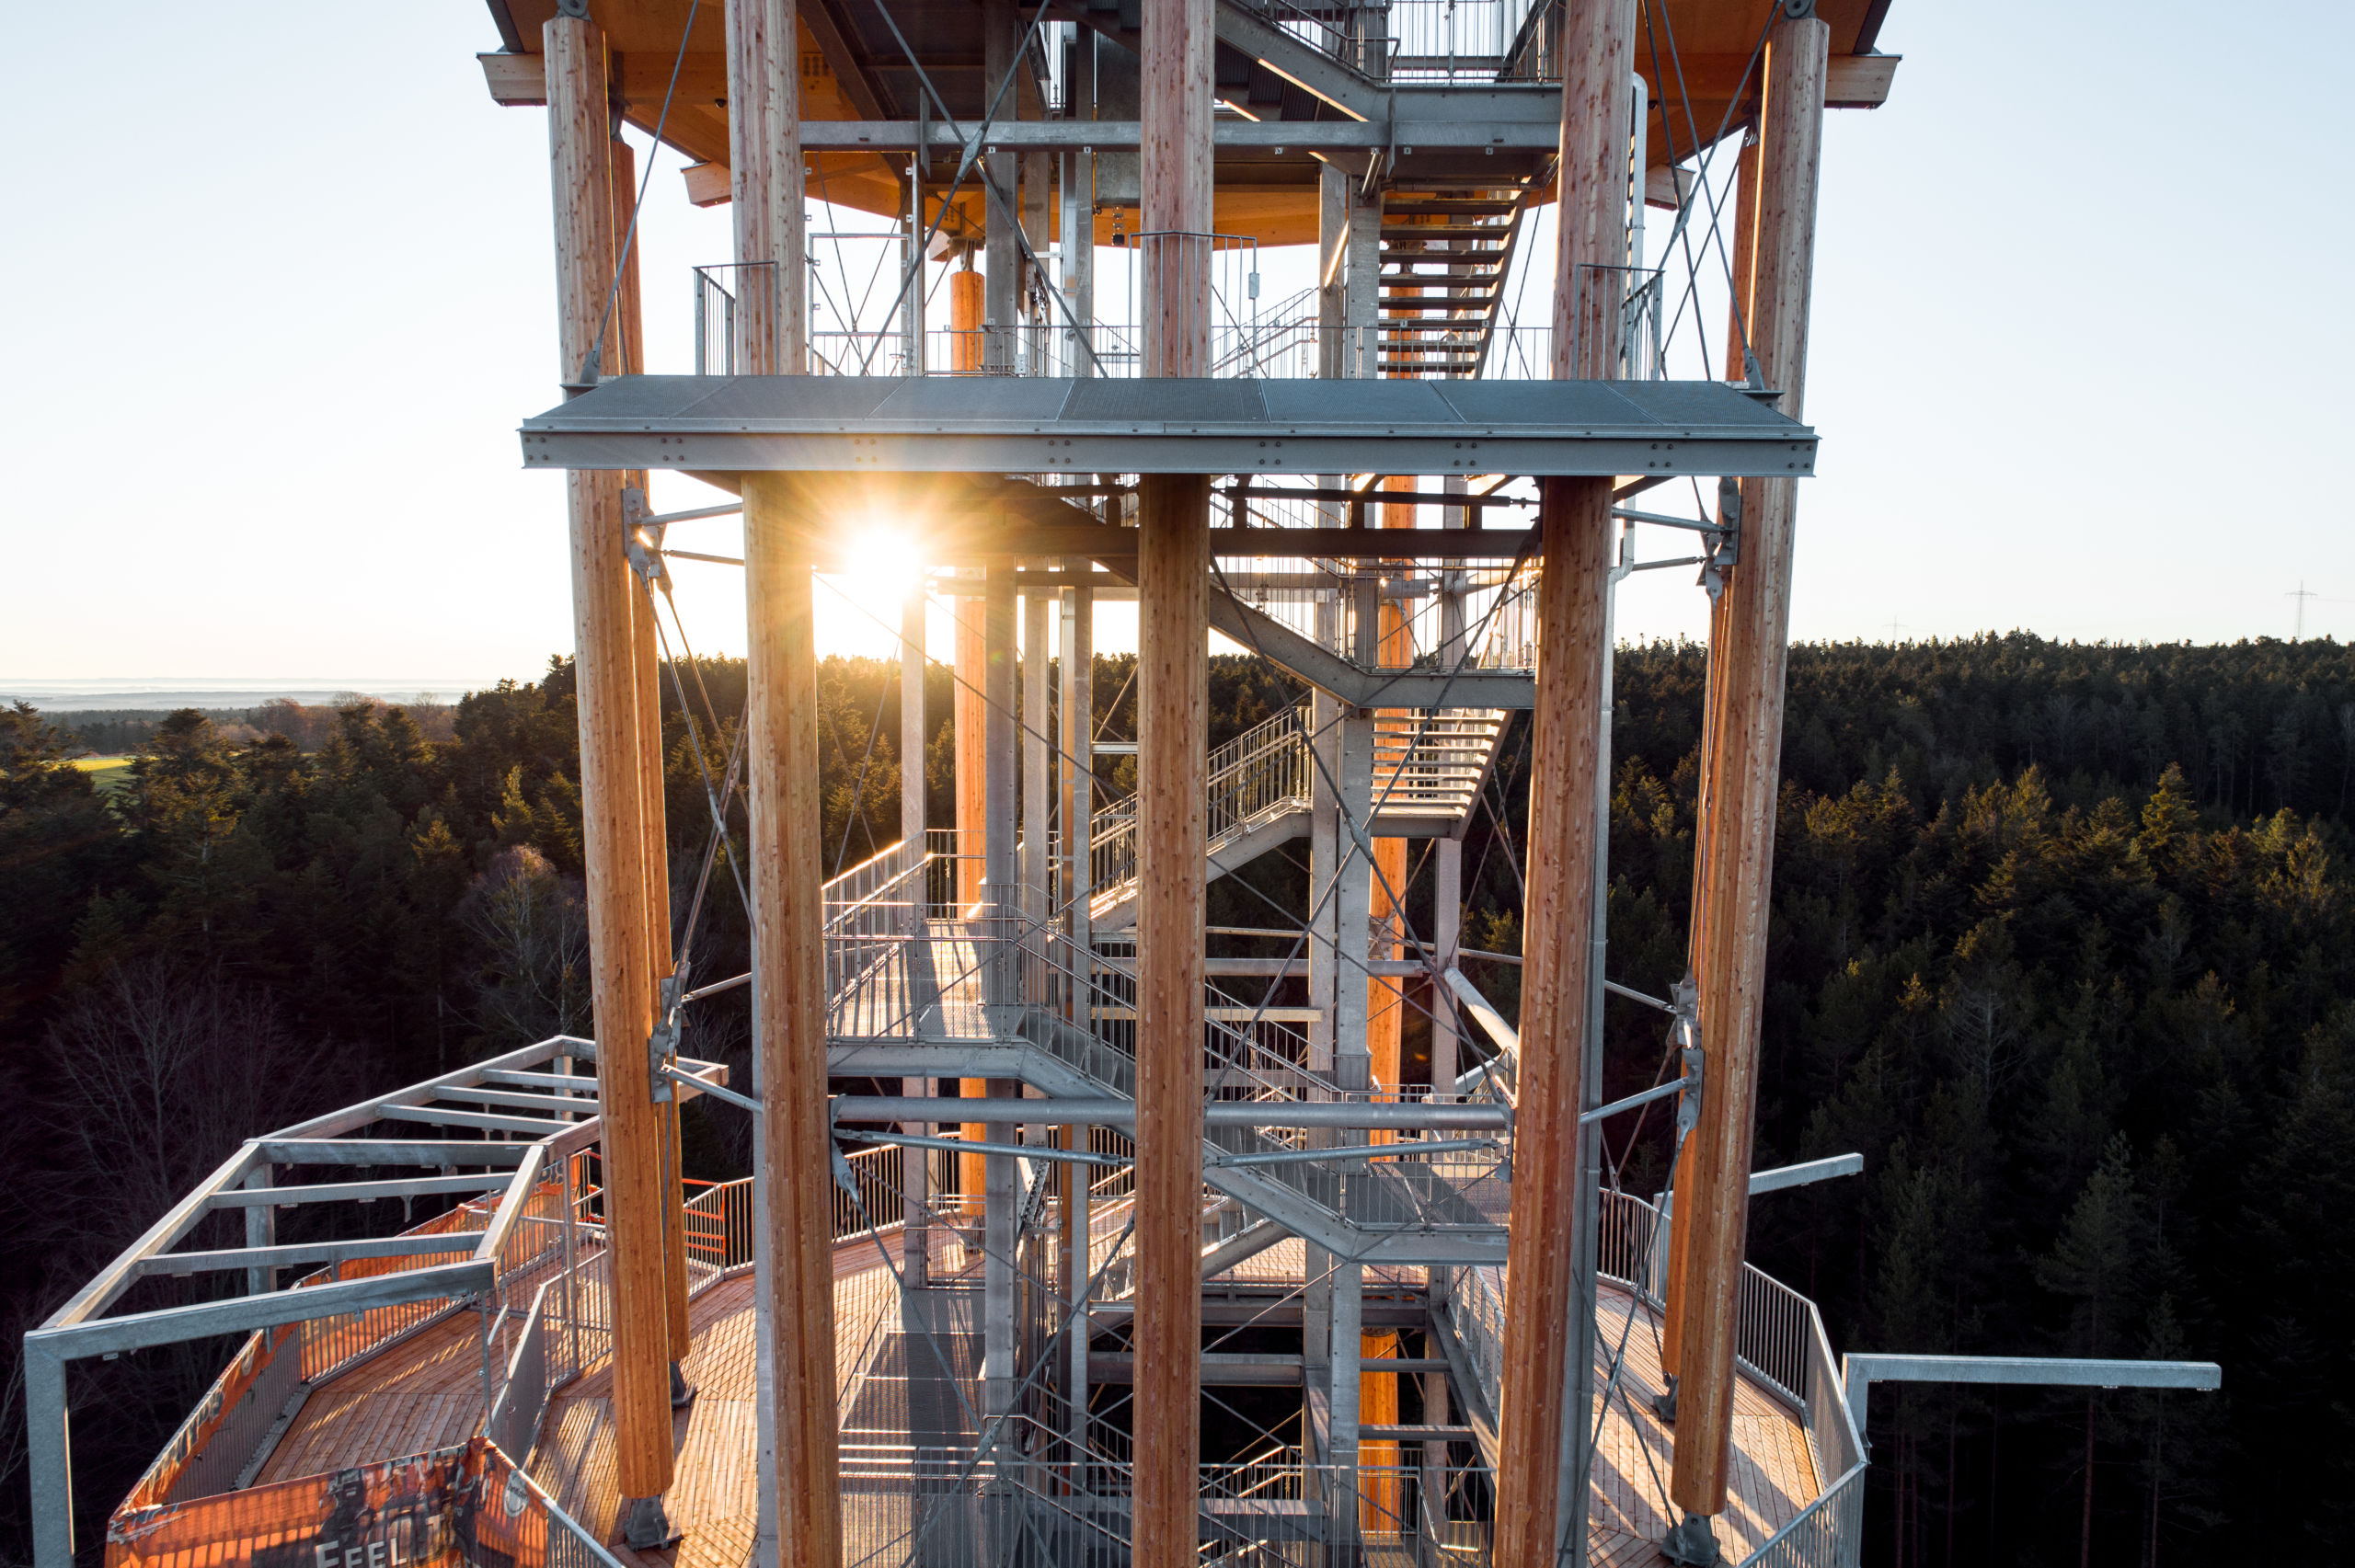 Stahlbau-Aussichtsturm-Schömberg-Stahlbau